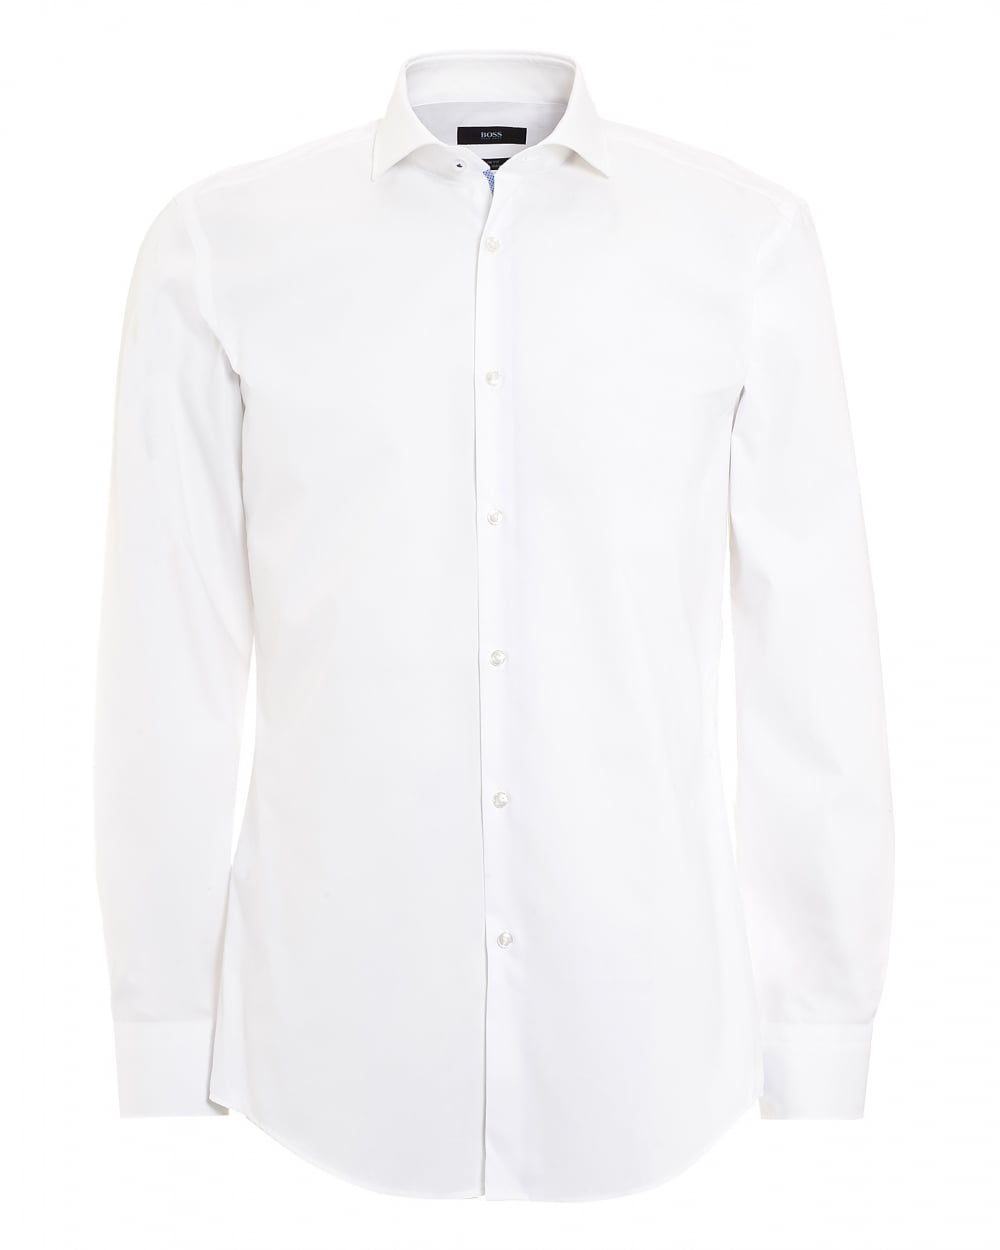 Plane White Shirt South Park T Shirts